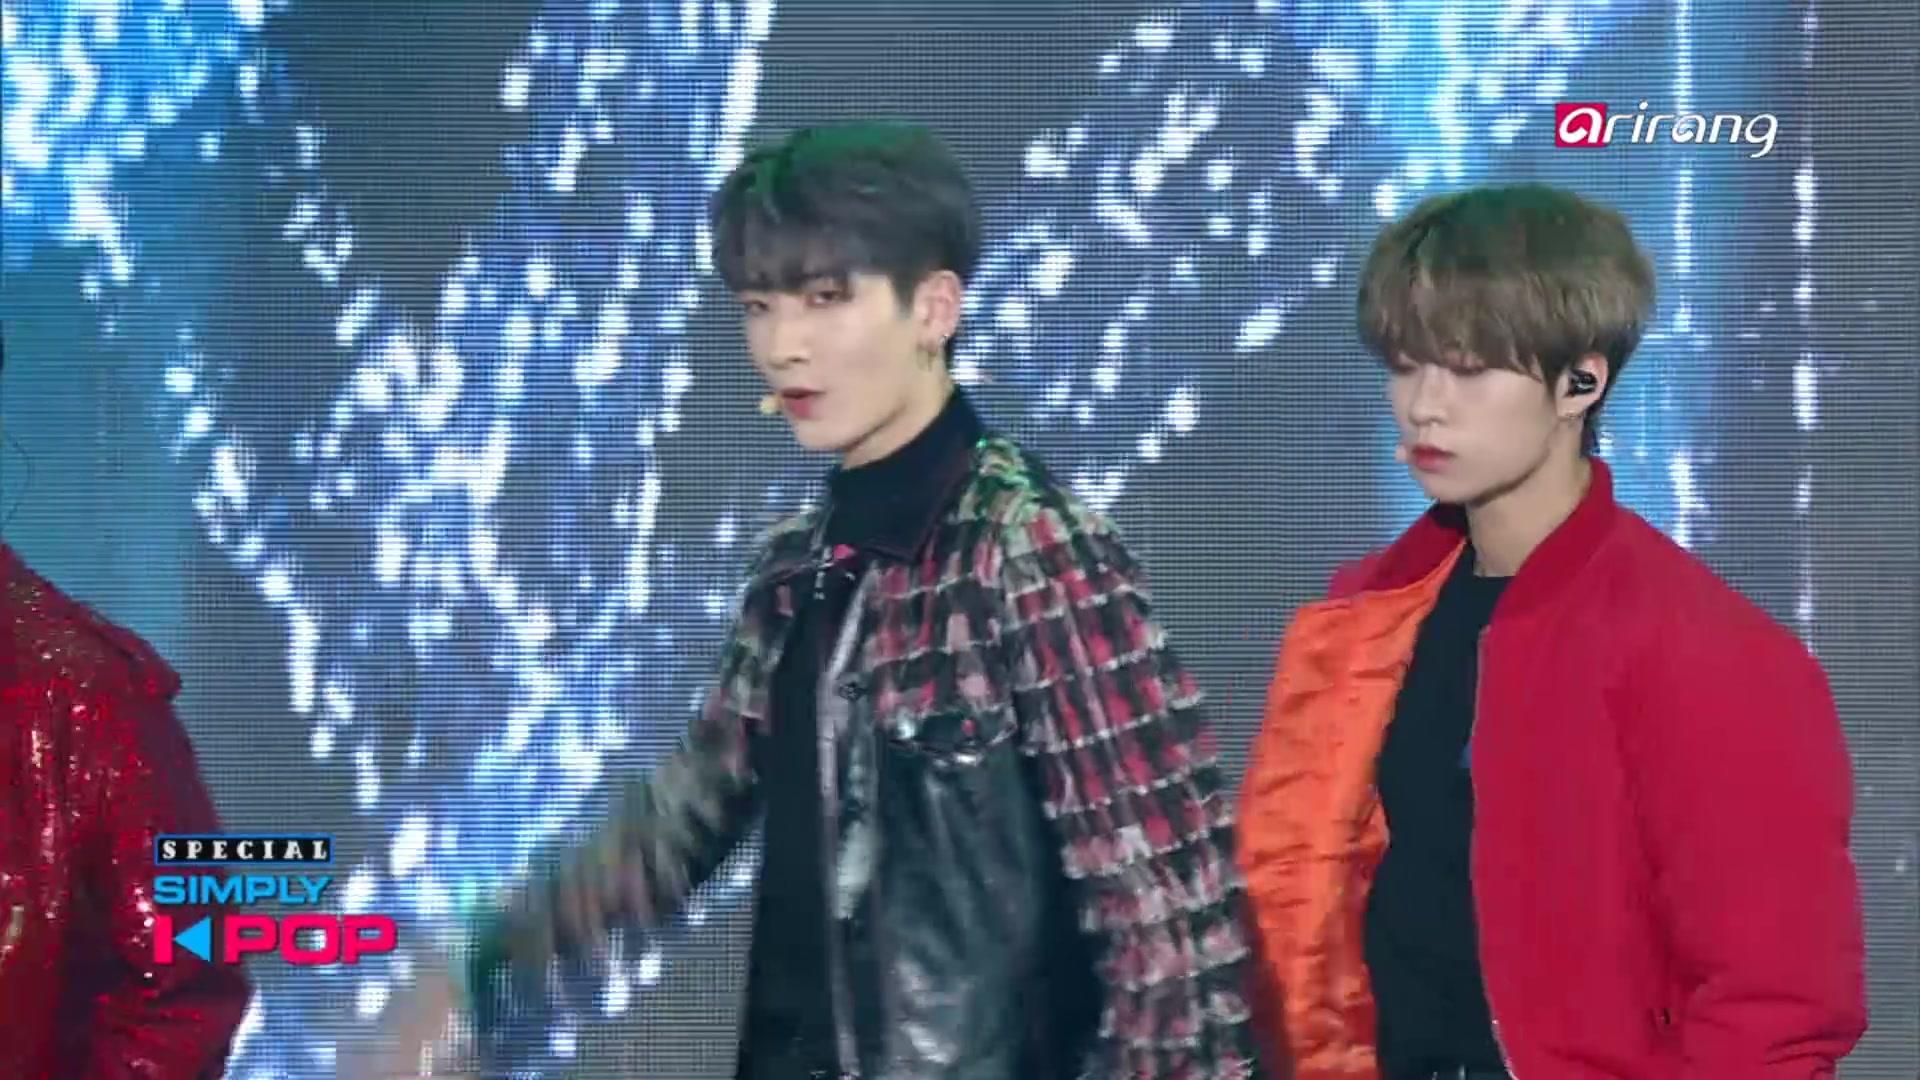 Simply K-pop Episode 300